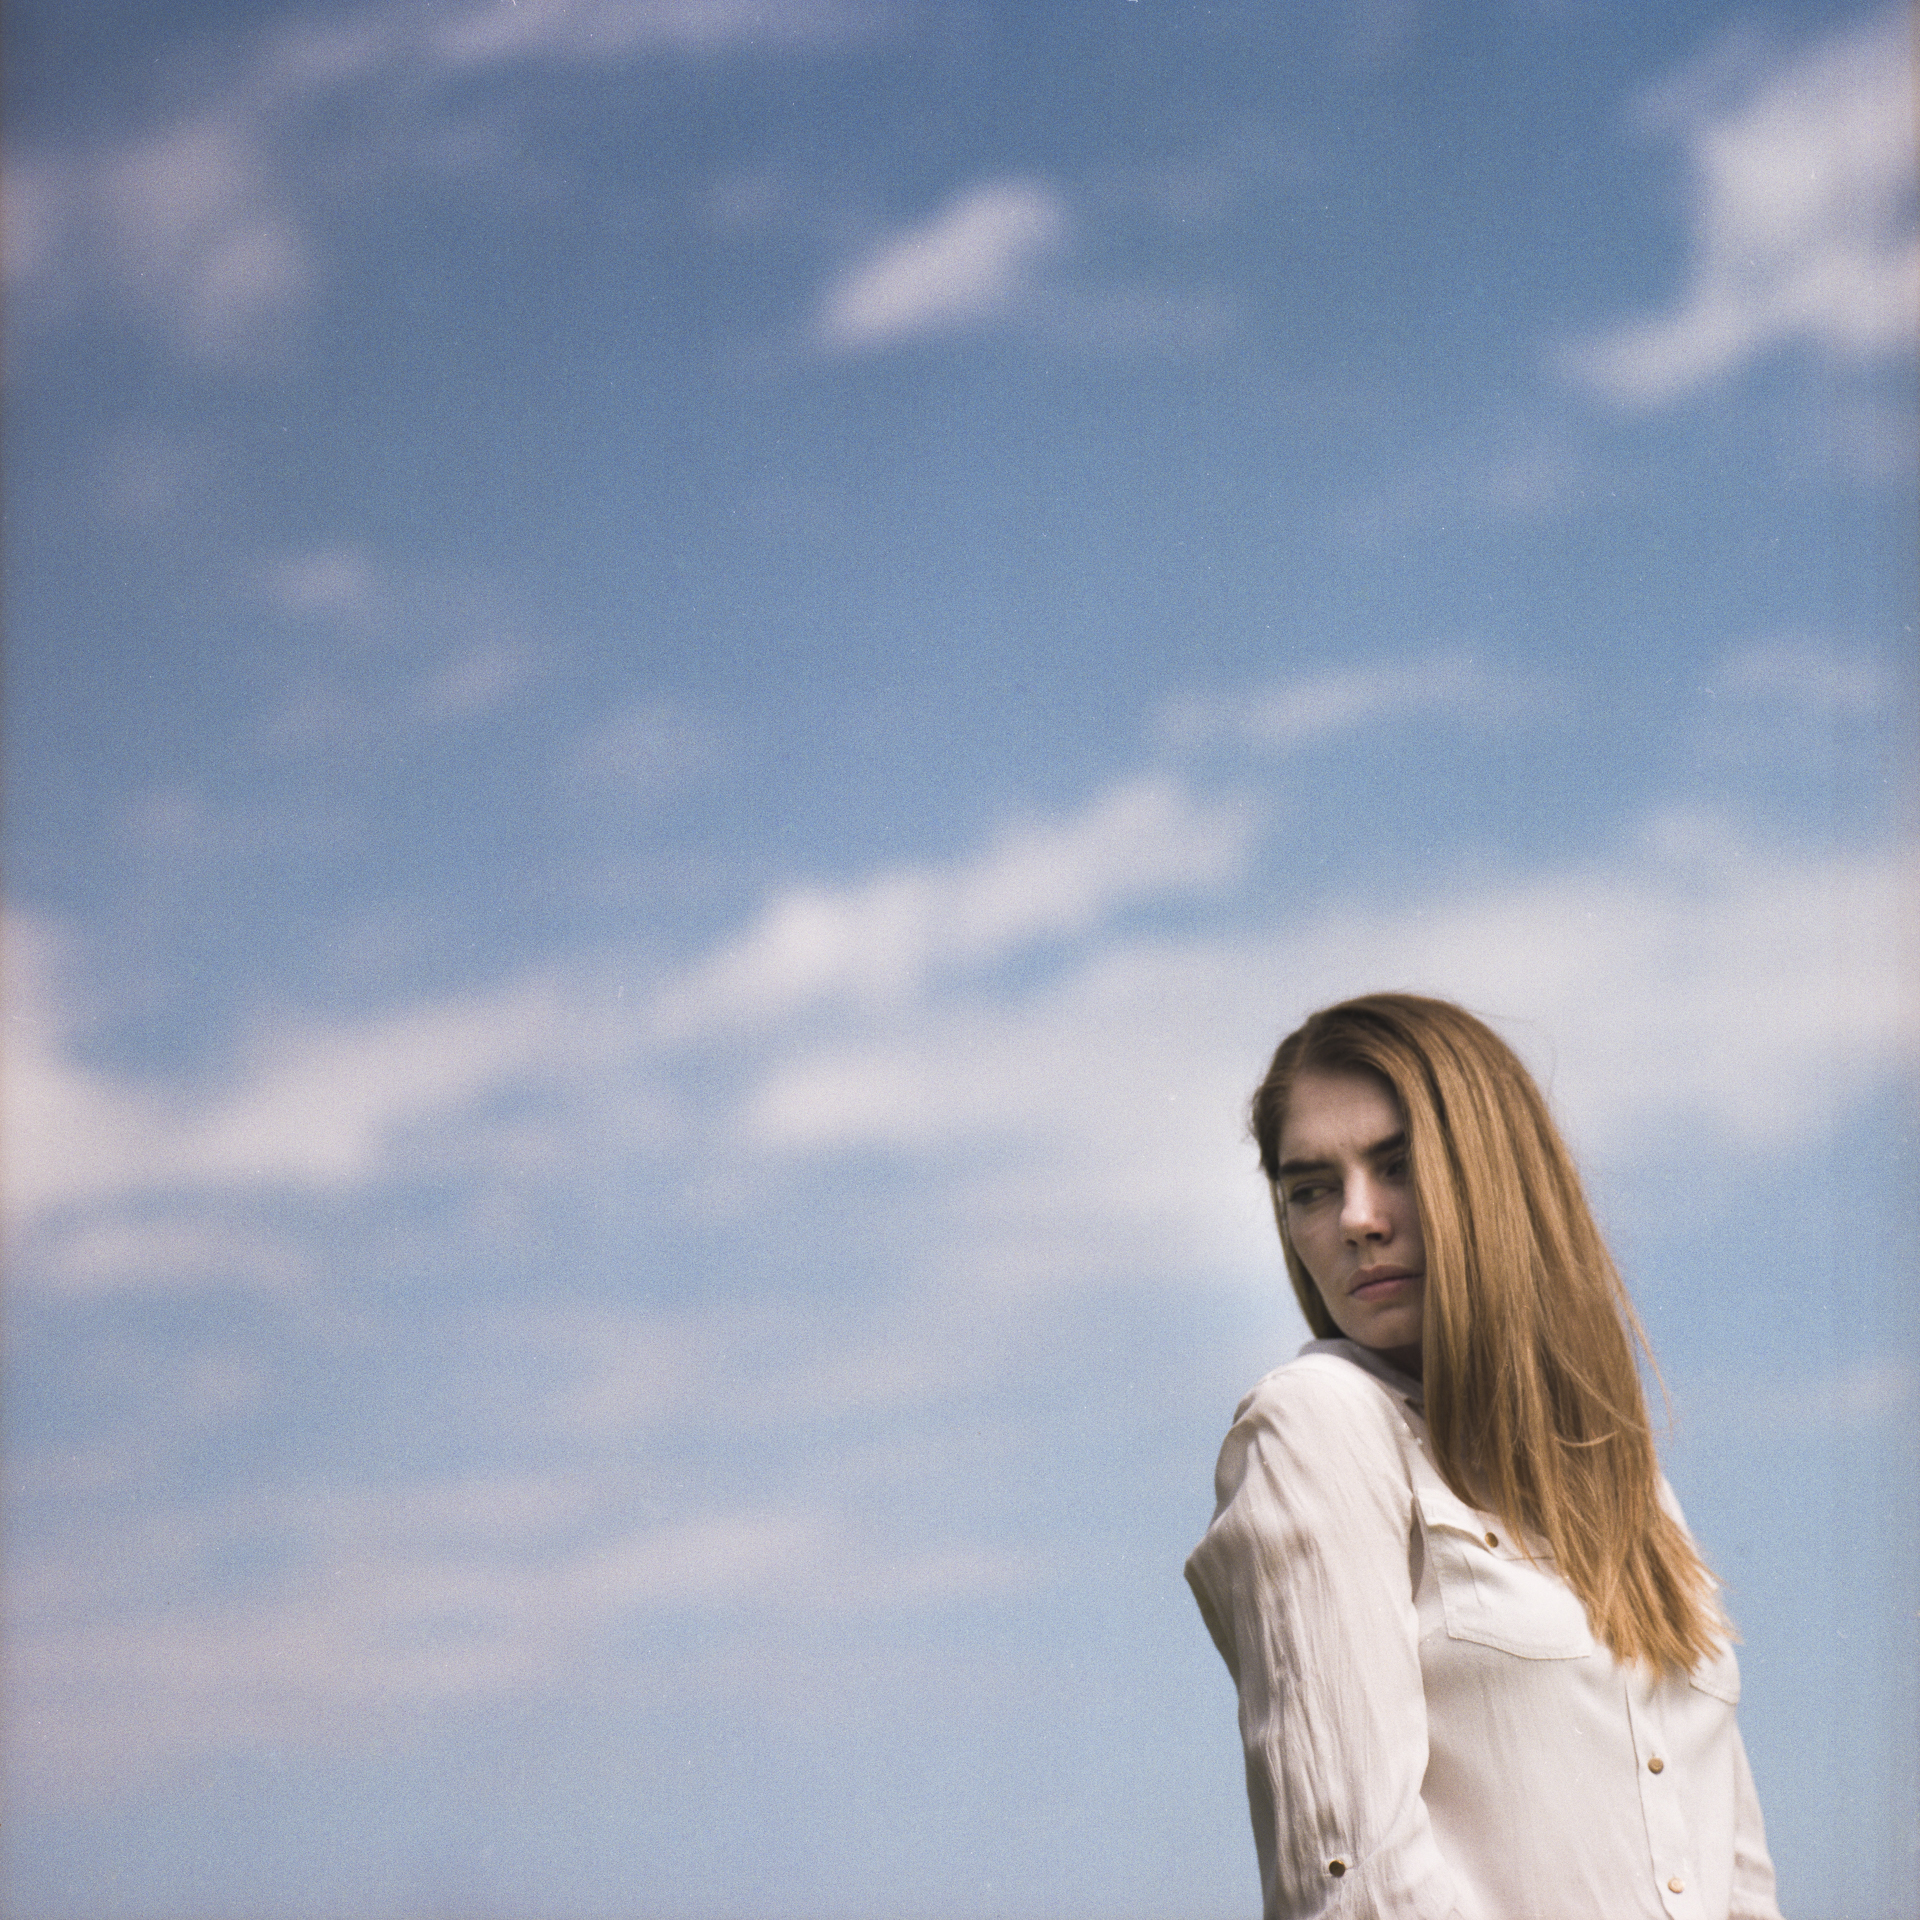 Rebecca-Courtney-RAW_16-10-2015_0001.jpg